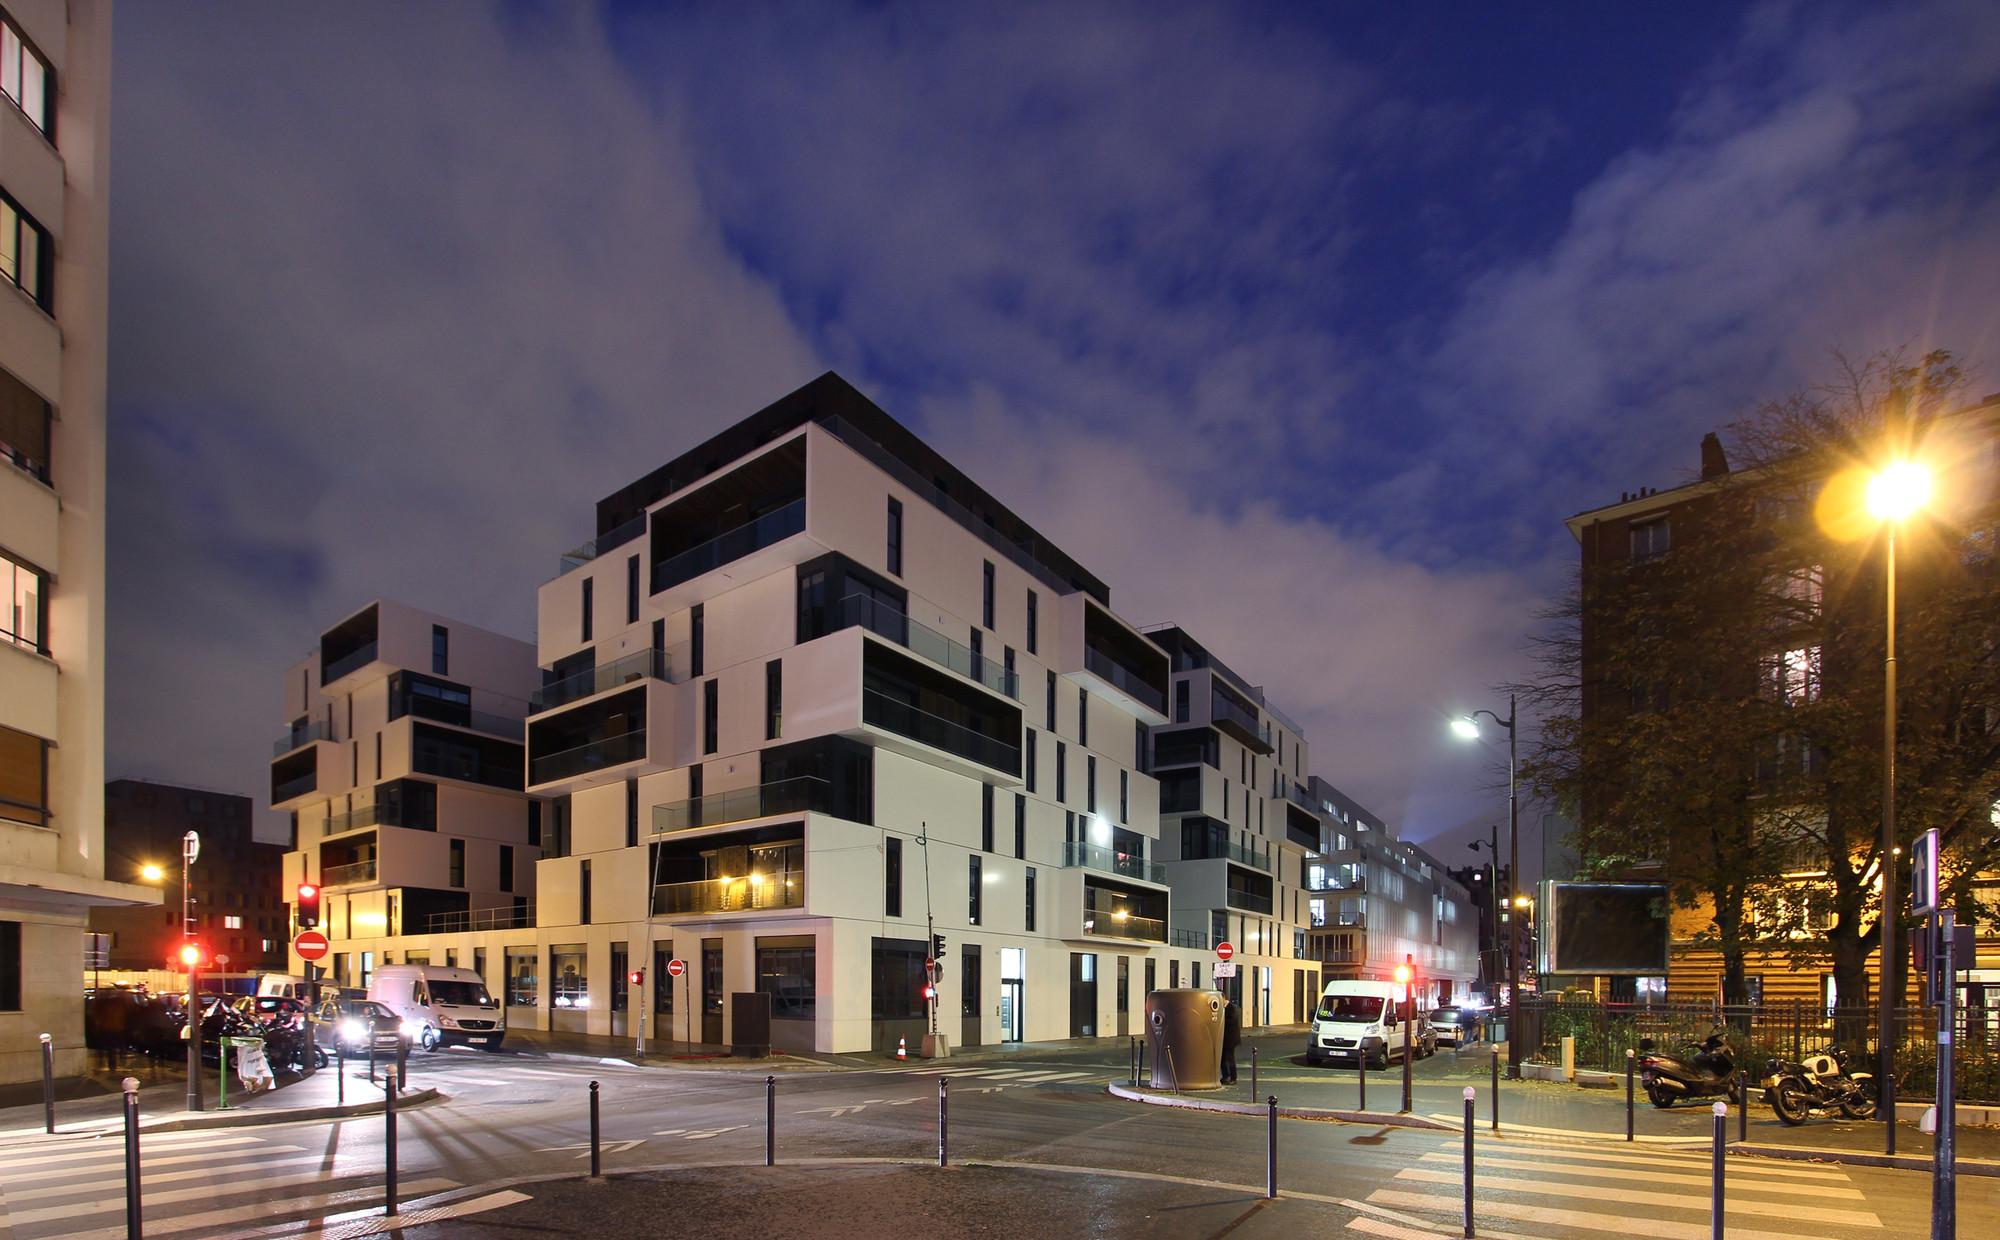 gallery of zac boucicaut in paris ameller dubois associ s architectes 20. Black Bedroom Furniture Sets. Home Design Ideas